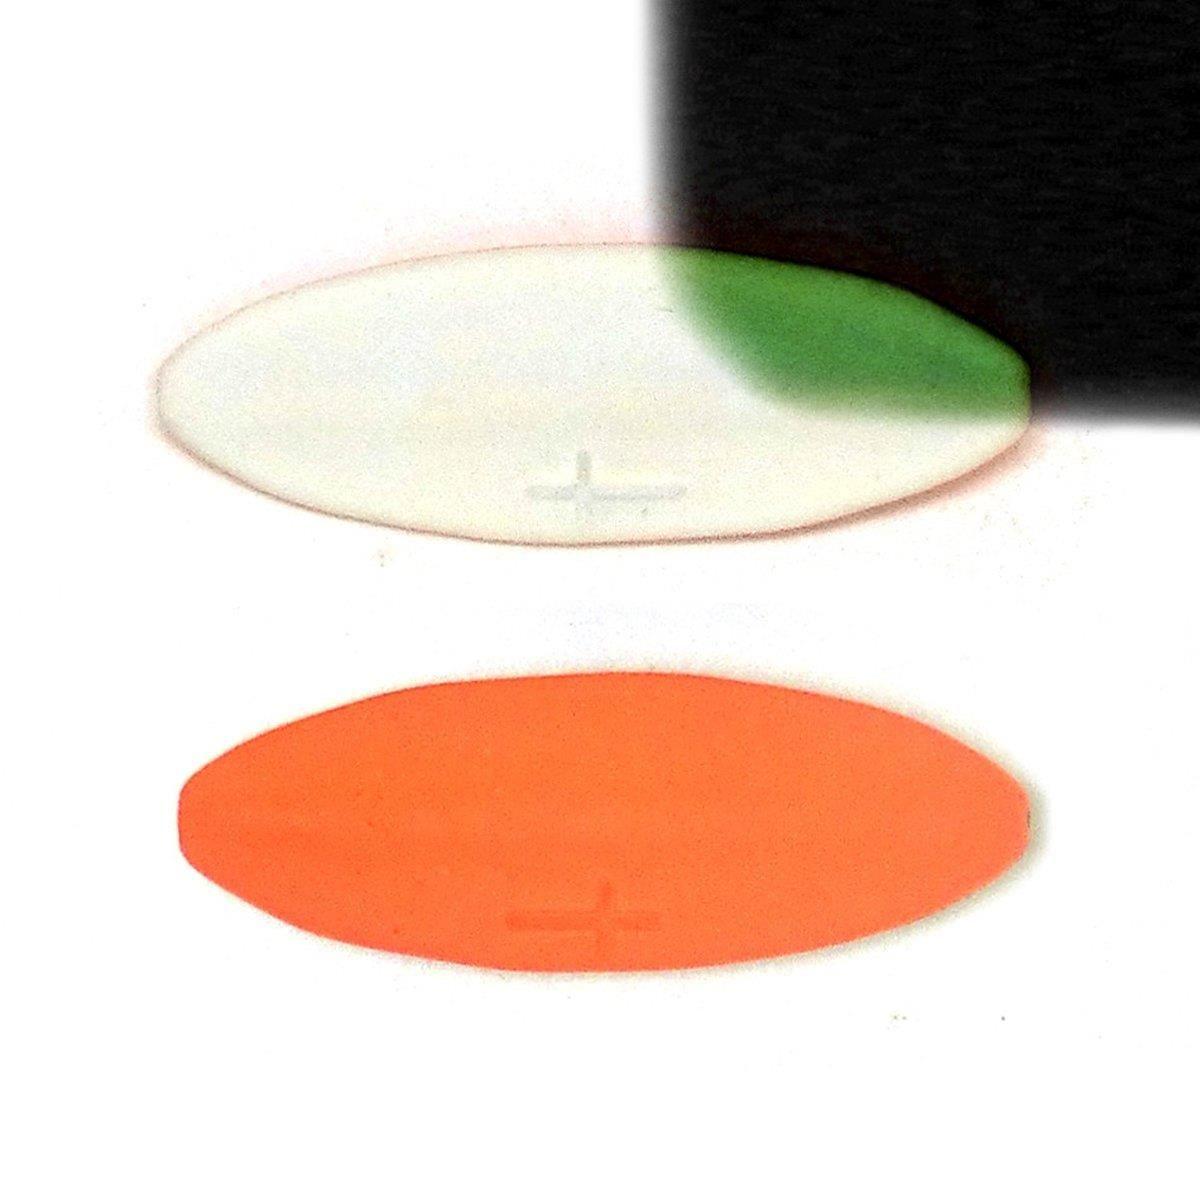 Grün-pink Praesten Durchlaufblinker Forellenblinker UL 4,5g